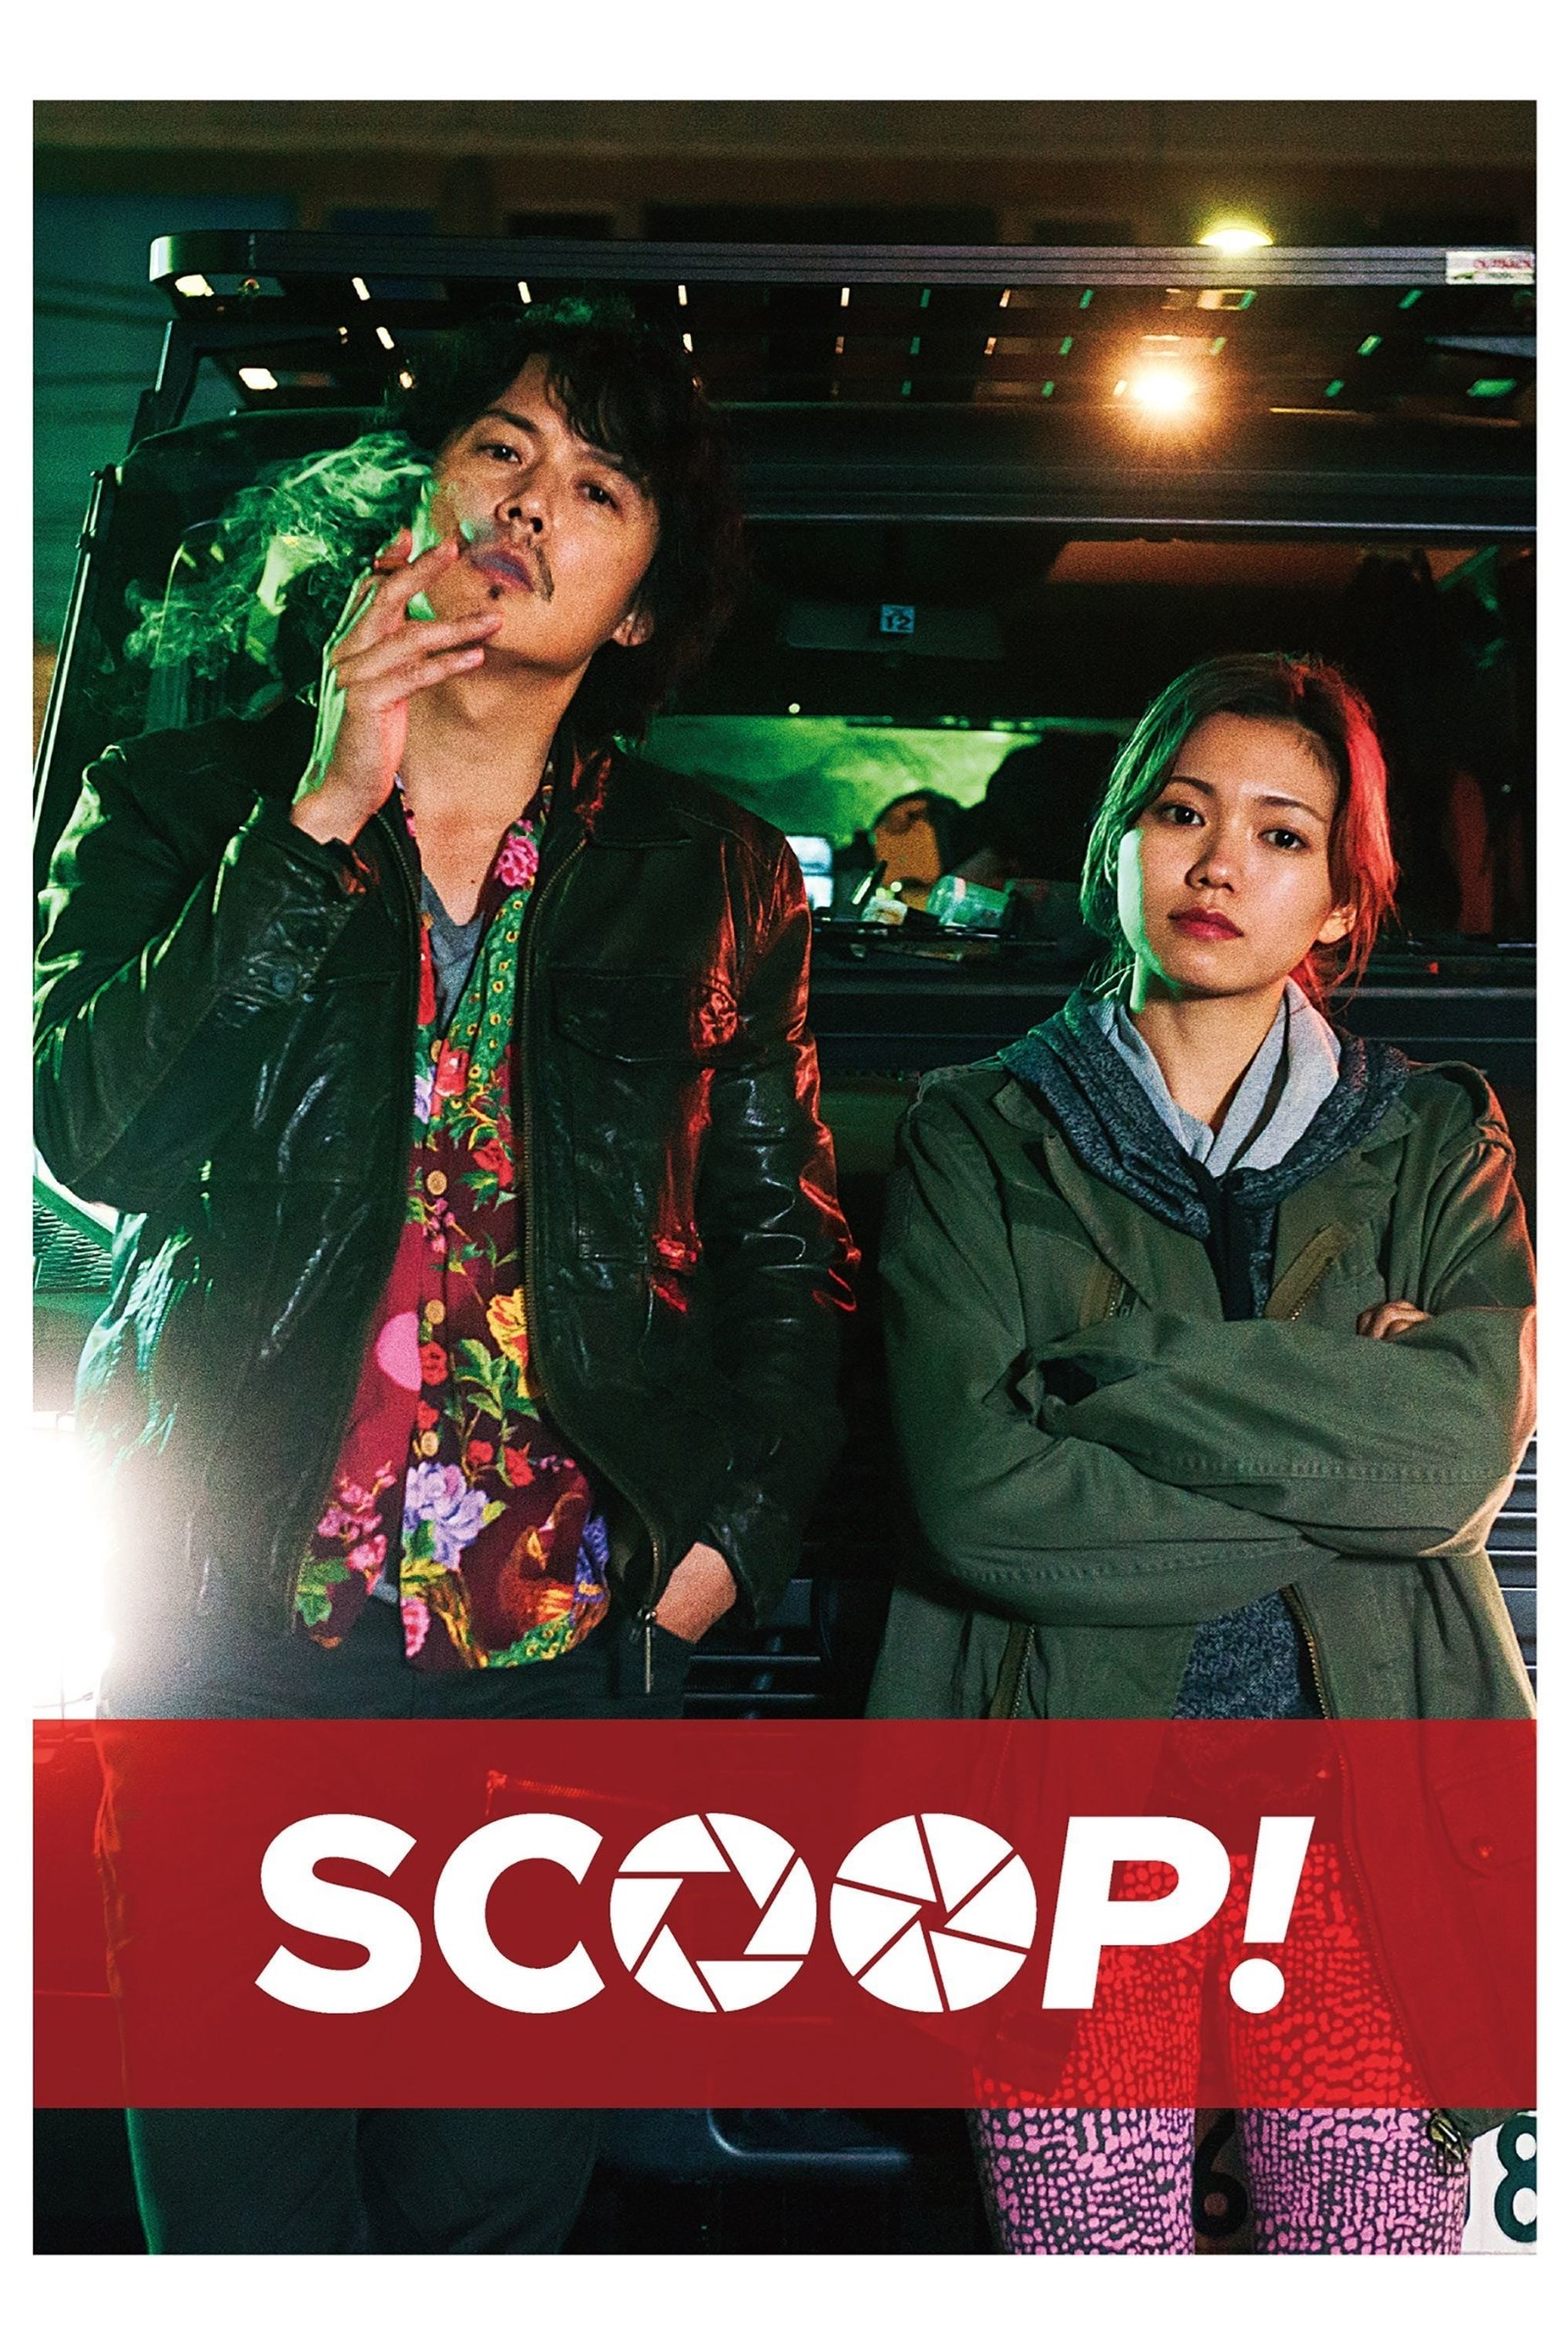 Subscene - Scoop! English subtitle